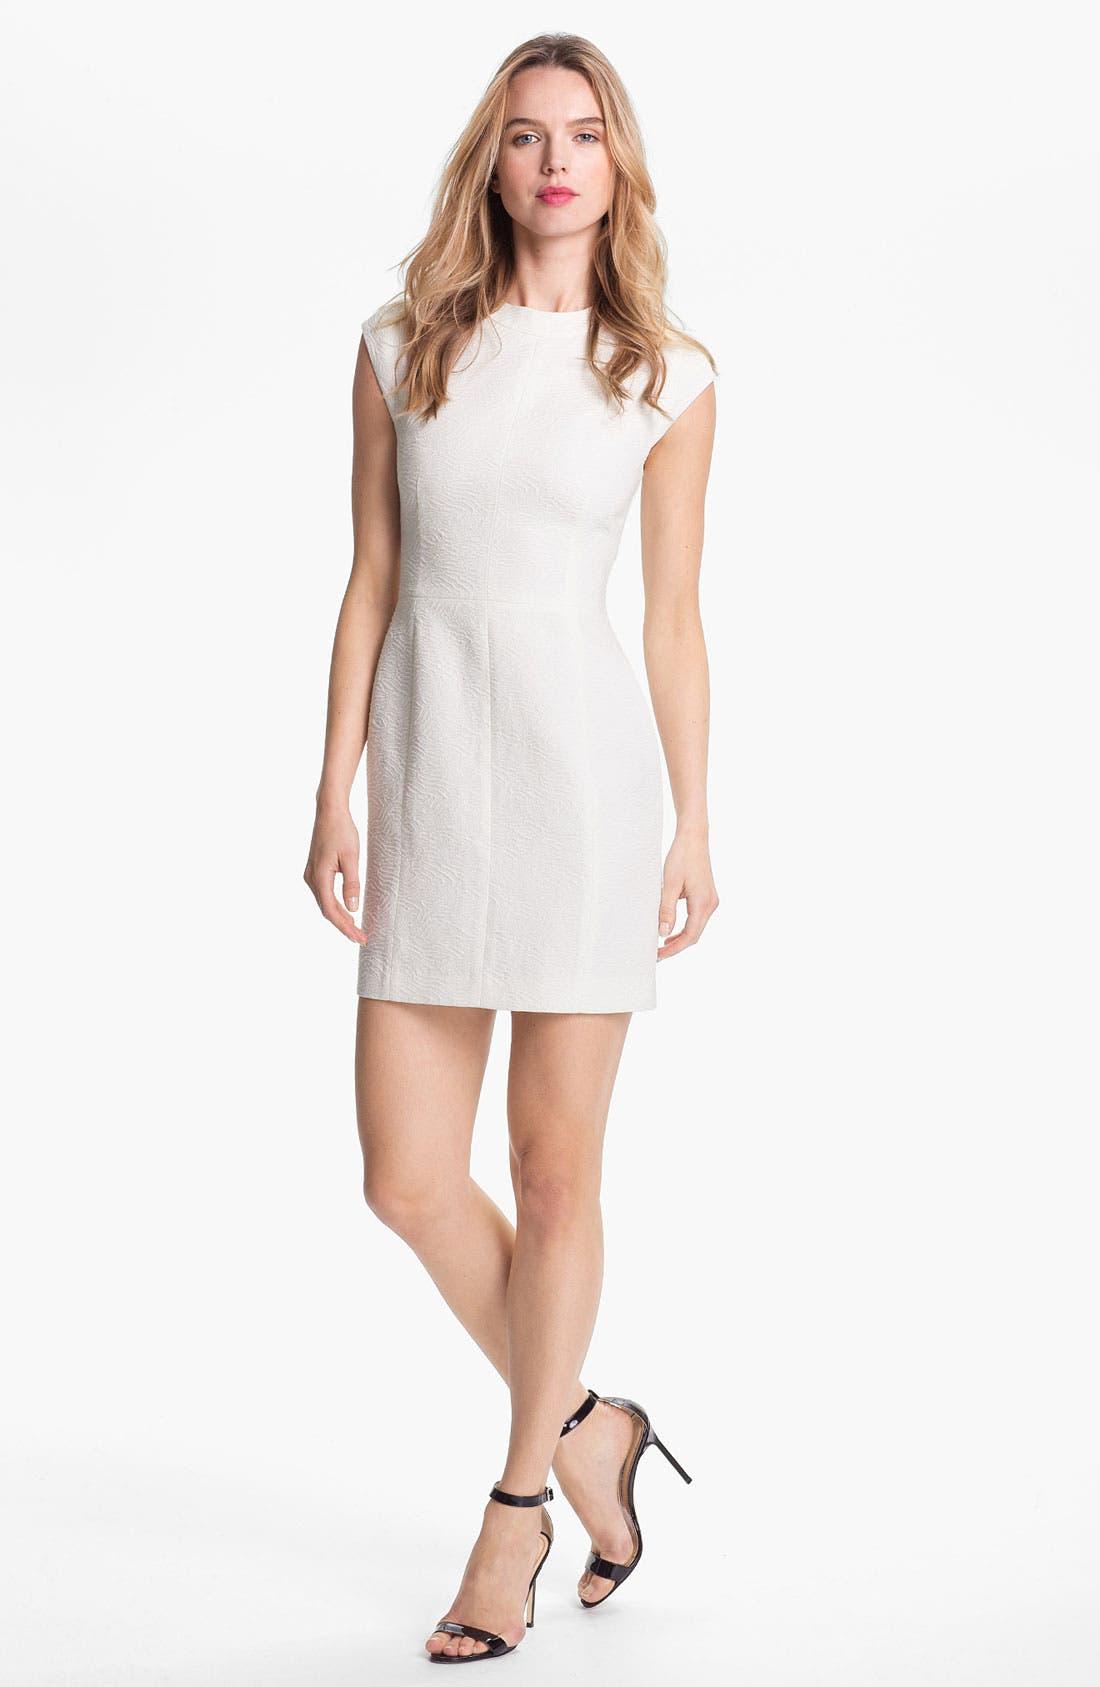 Alternate Image 1 Selected - Theory 'Orinthia' Cotton Blend Sheath Dress